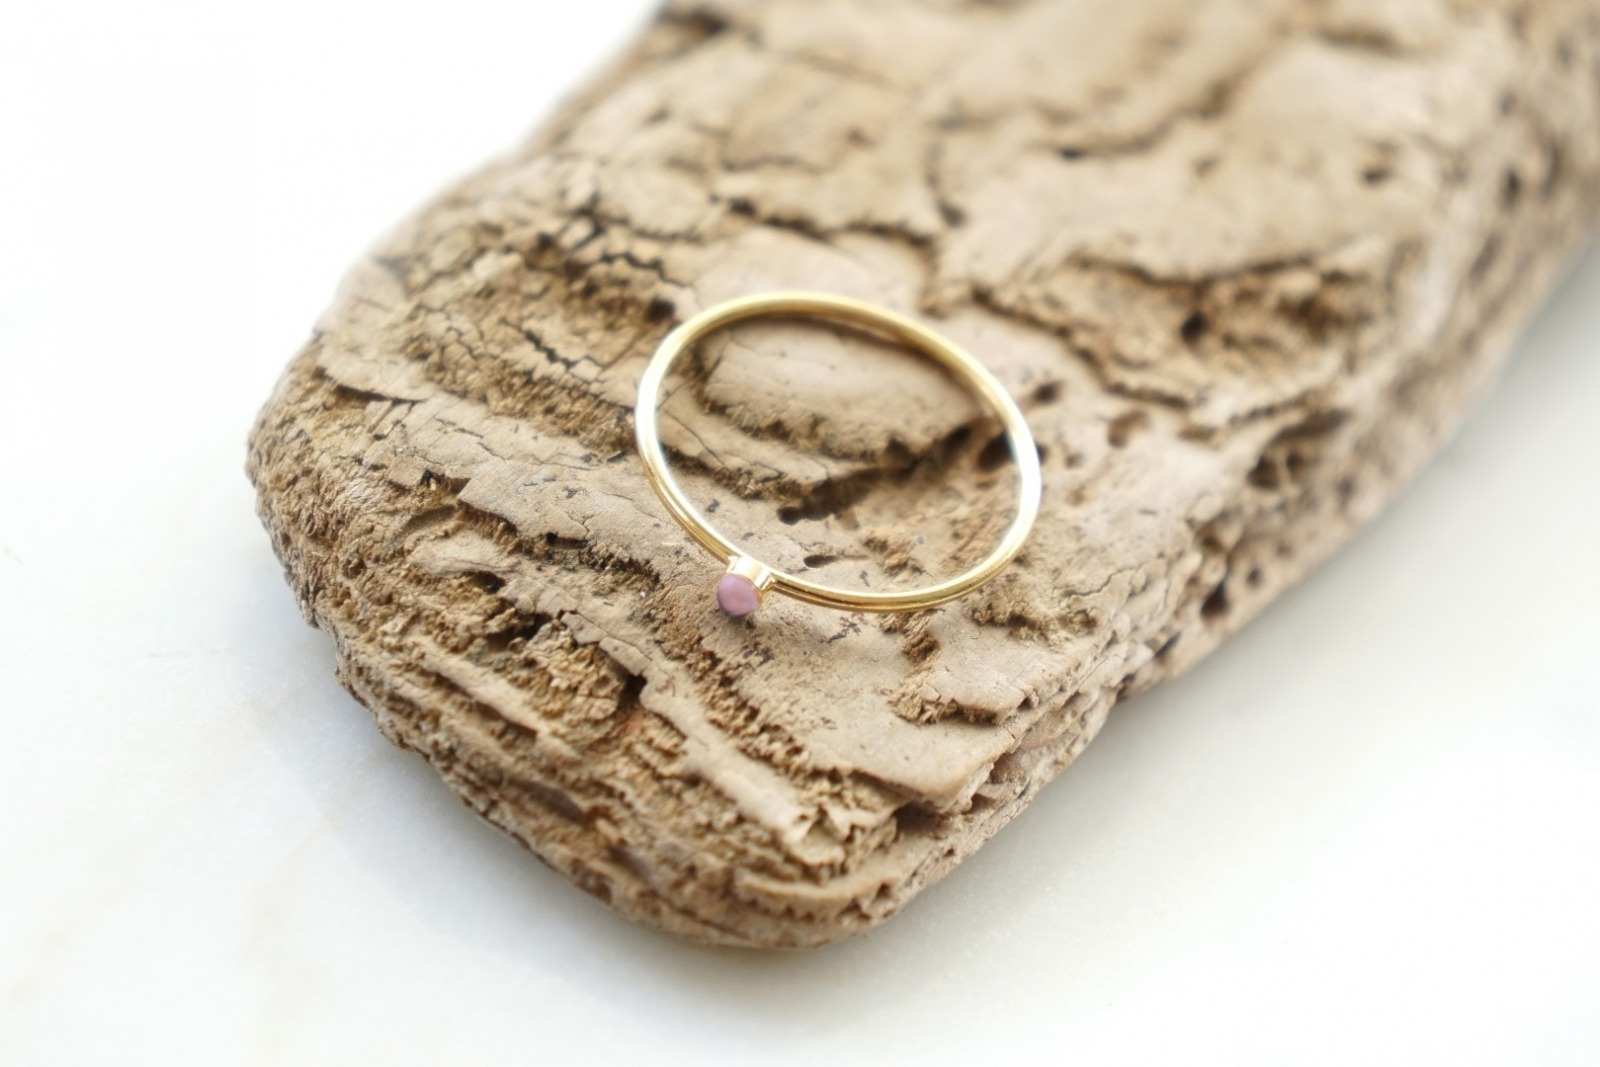 Zierlicher Ring Stapelring vergoldet Rosa Opal - 1